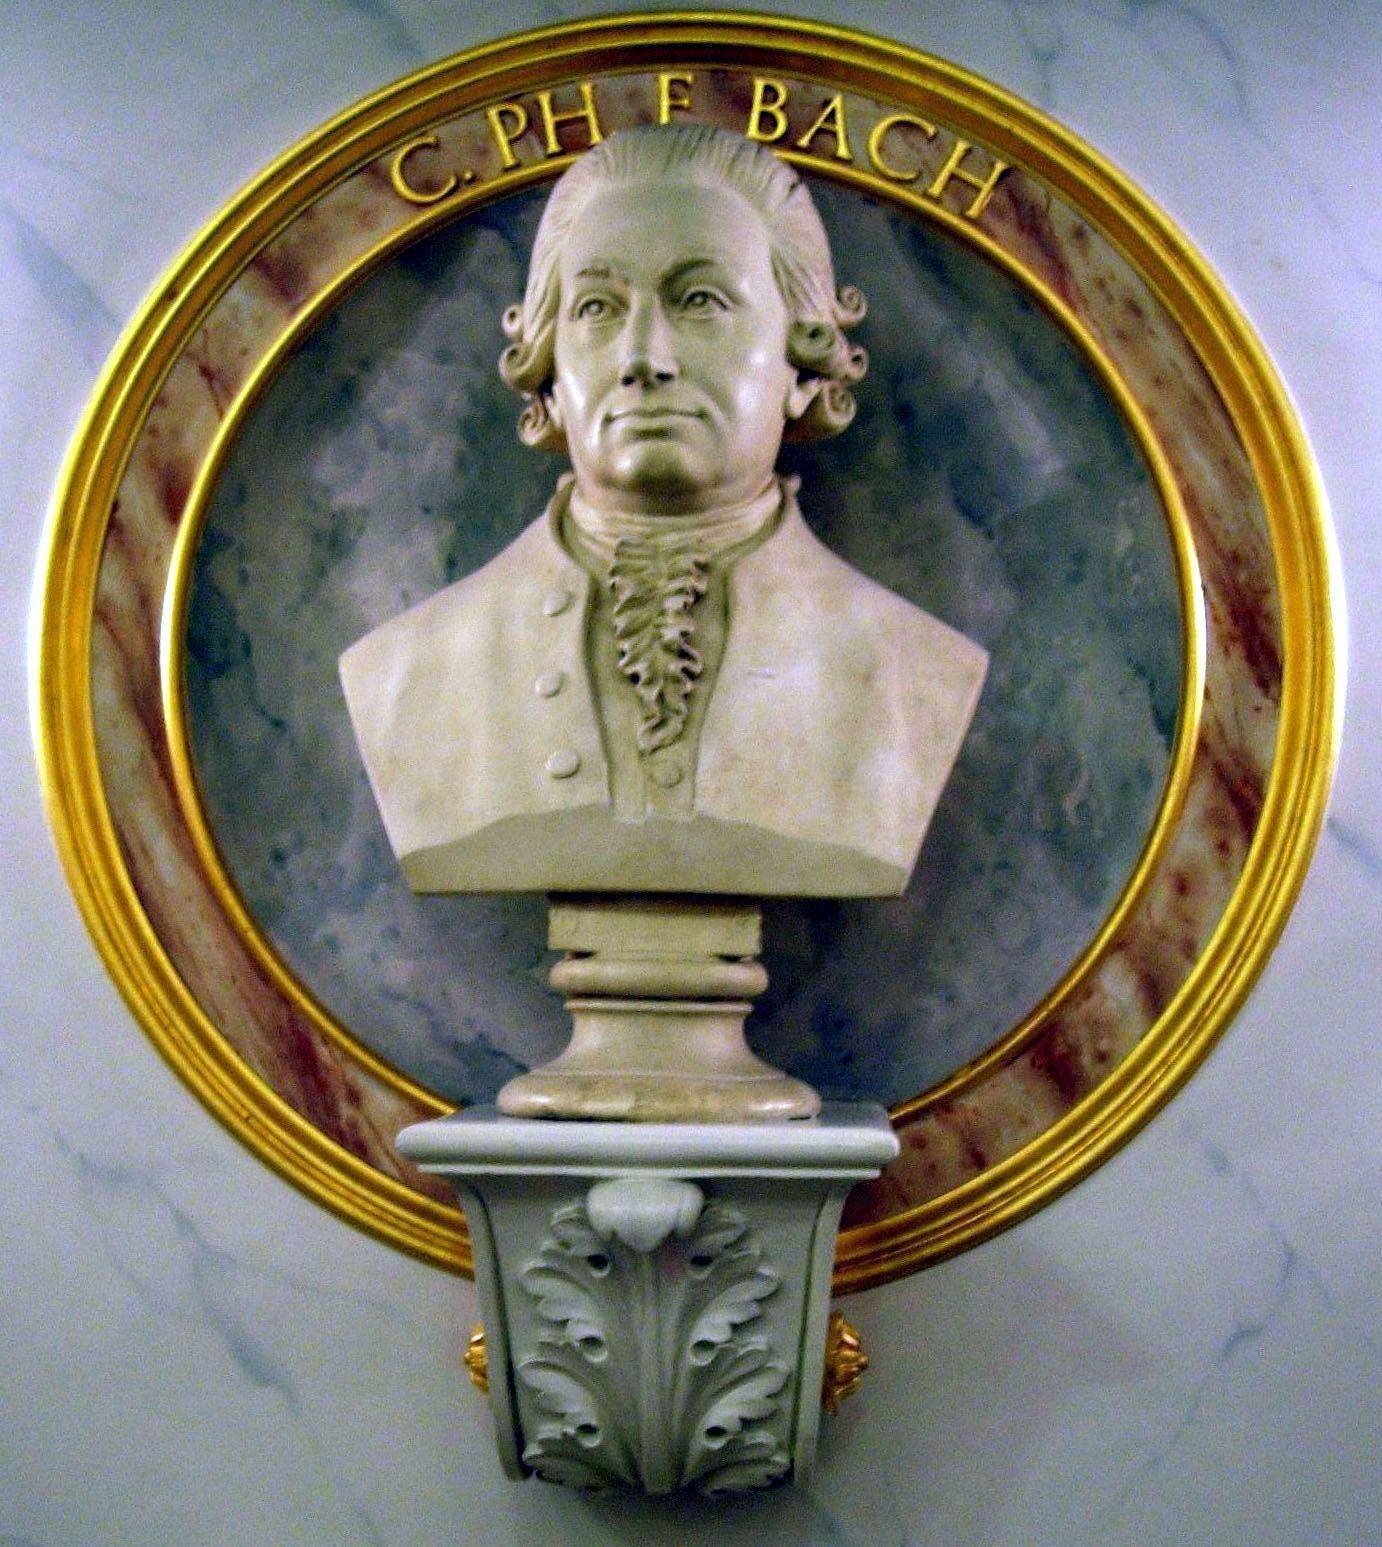 Citando C.P.E. Bach